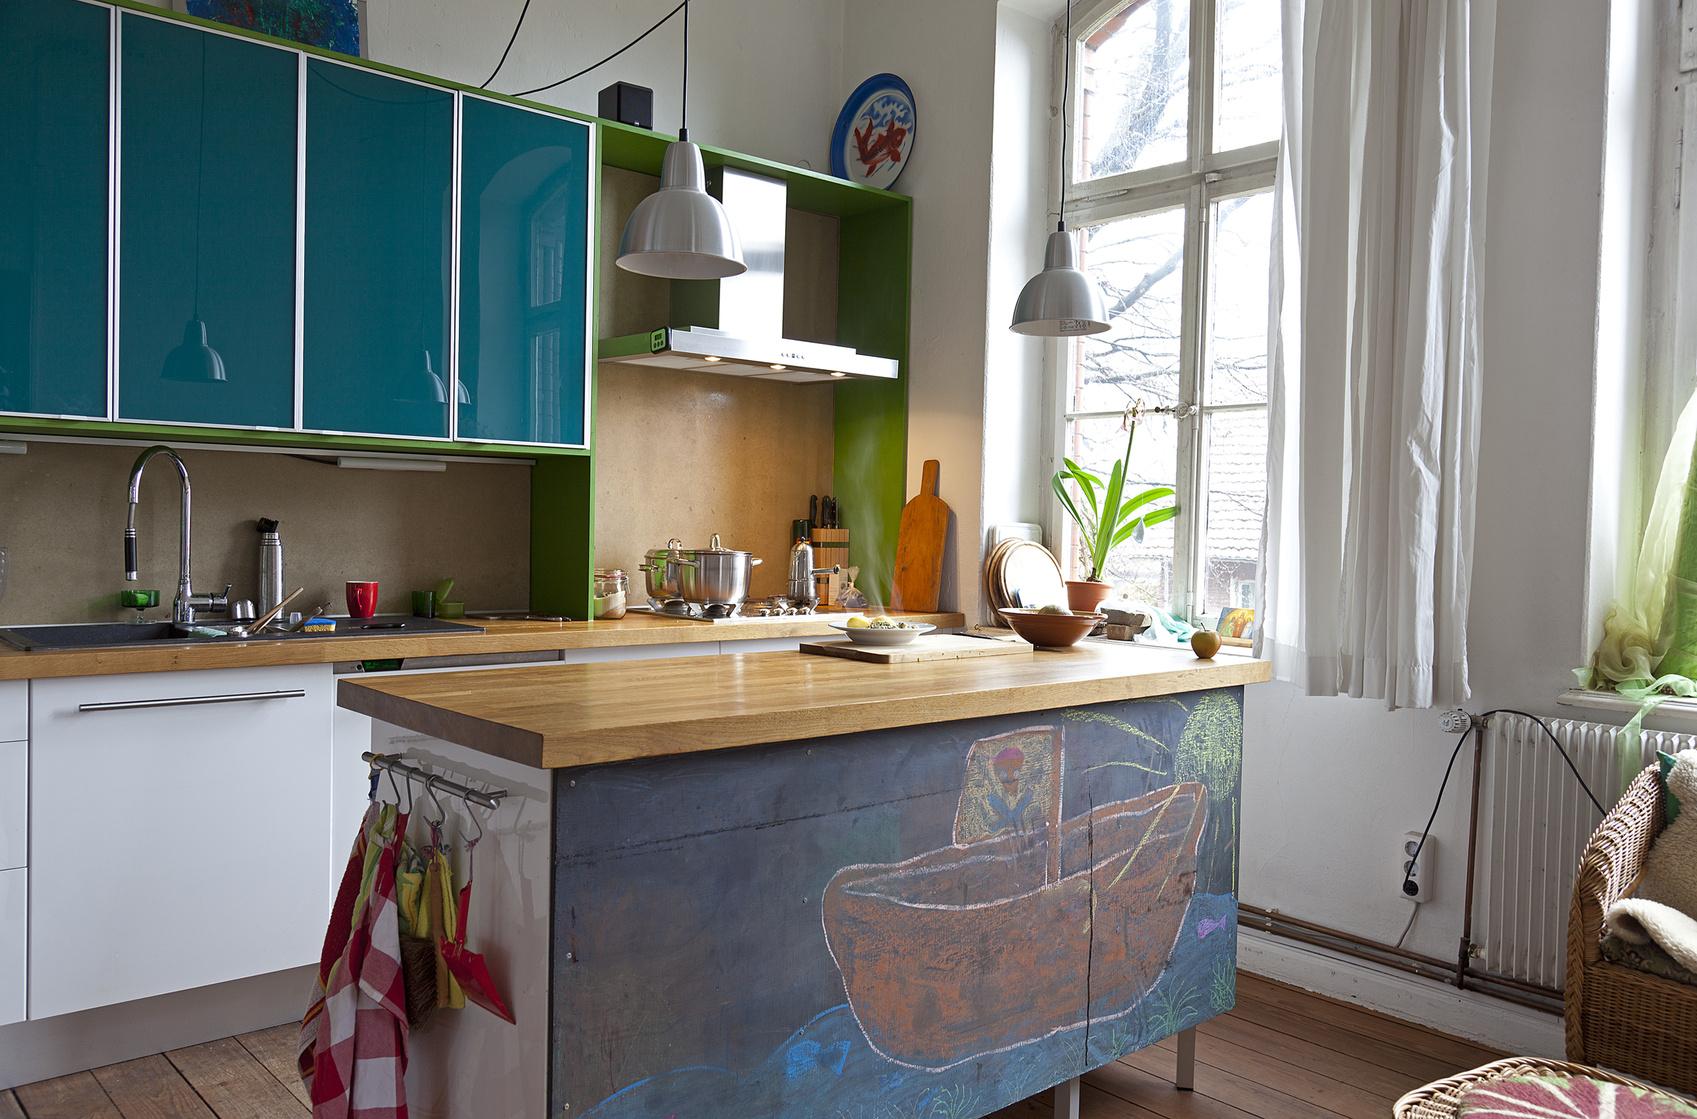 Küche ohne elektrogeräte planen  Nauhuri.com | Günstige Küche Ohne Elektrogeräte ~ Neuesten Design ...